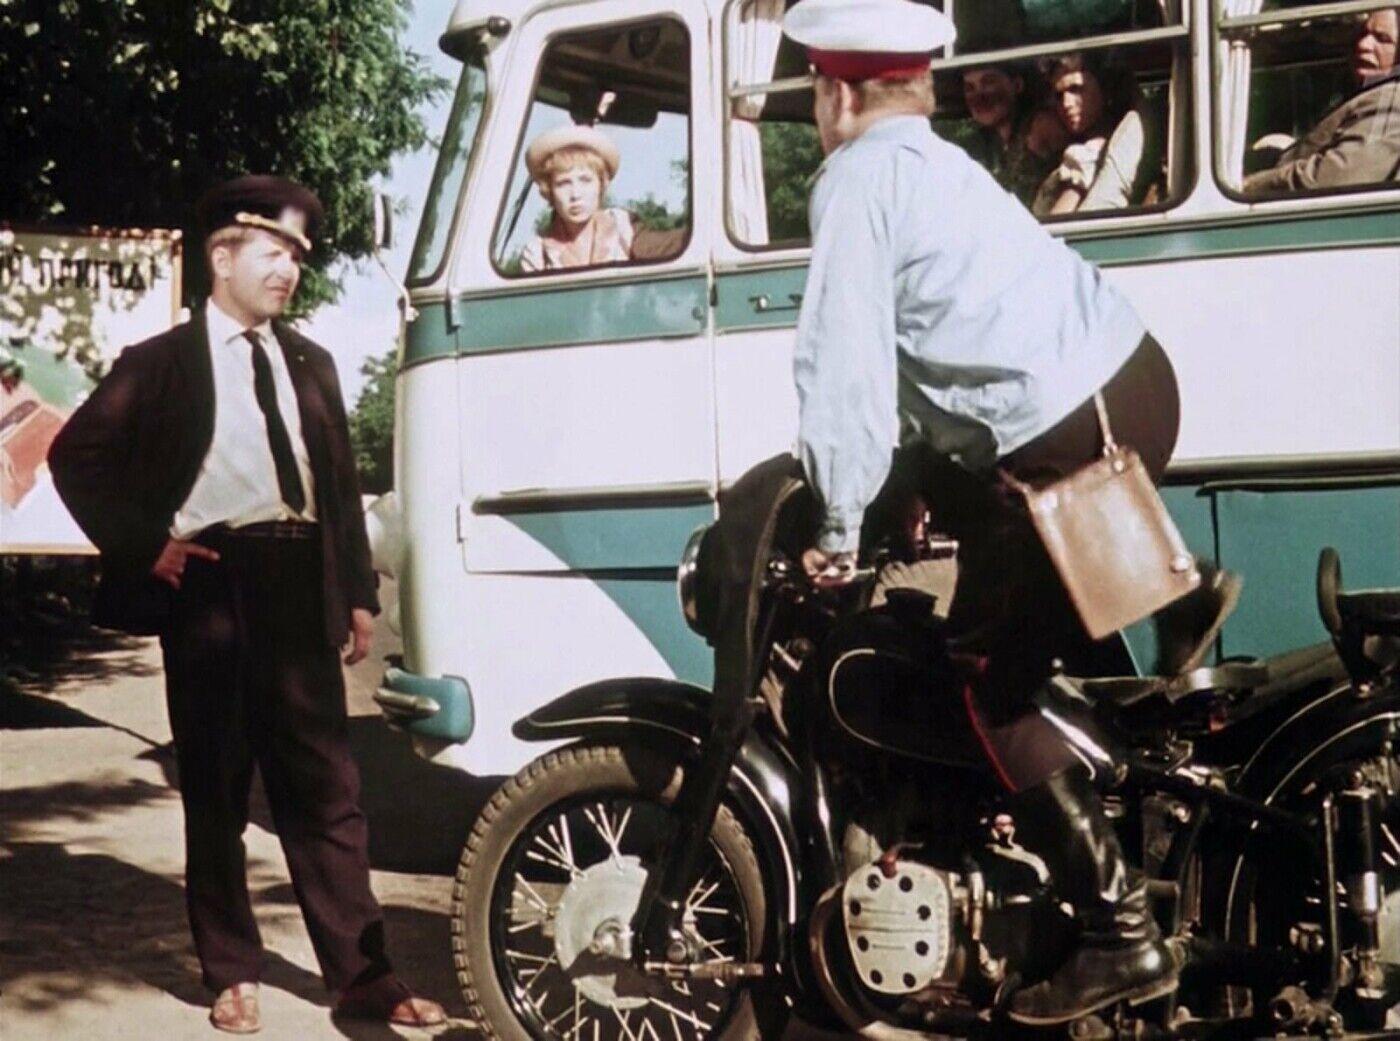 В фильме на мотоциклах КМЗ ездили милиционеры.